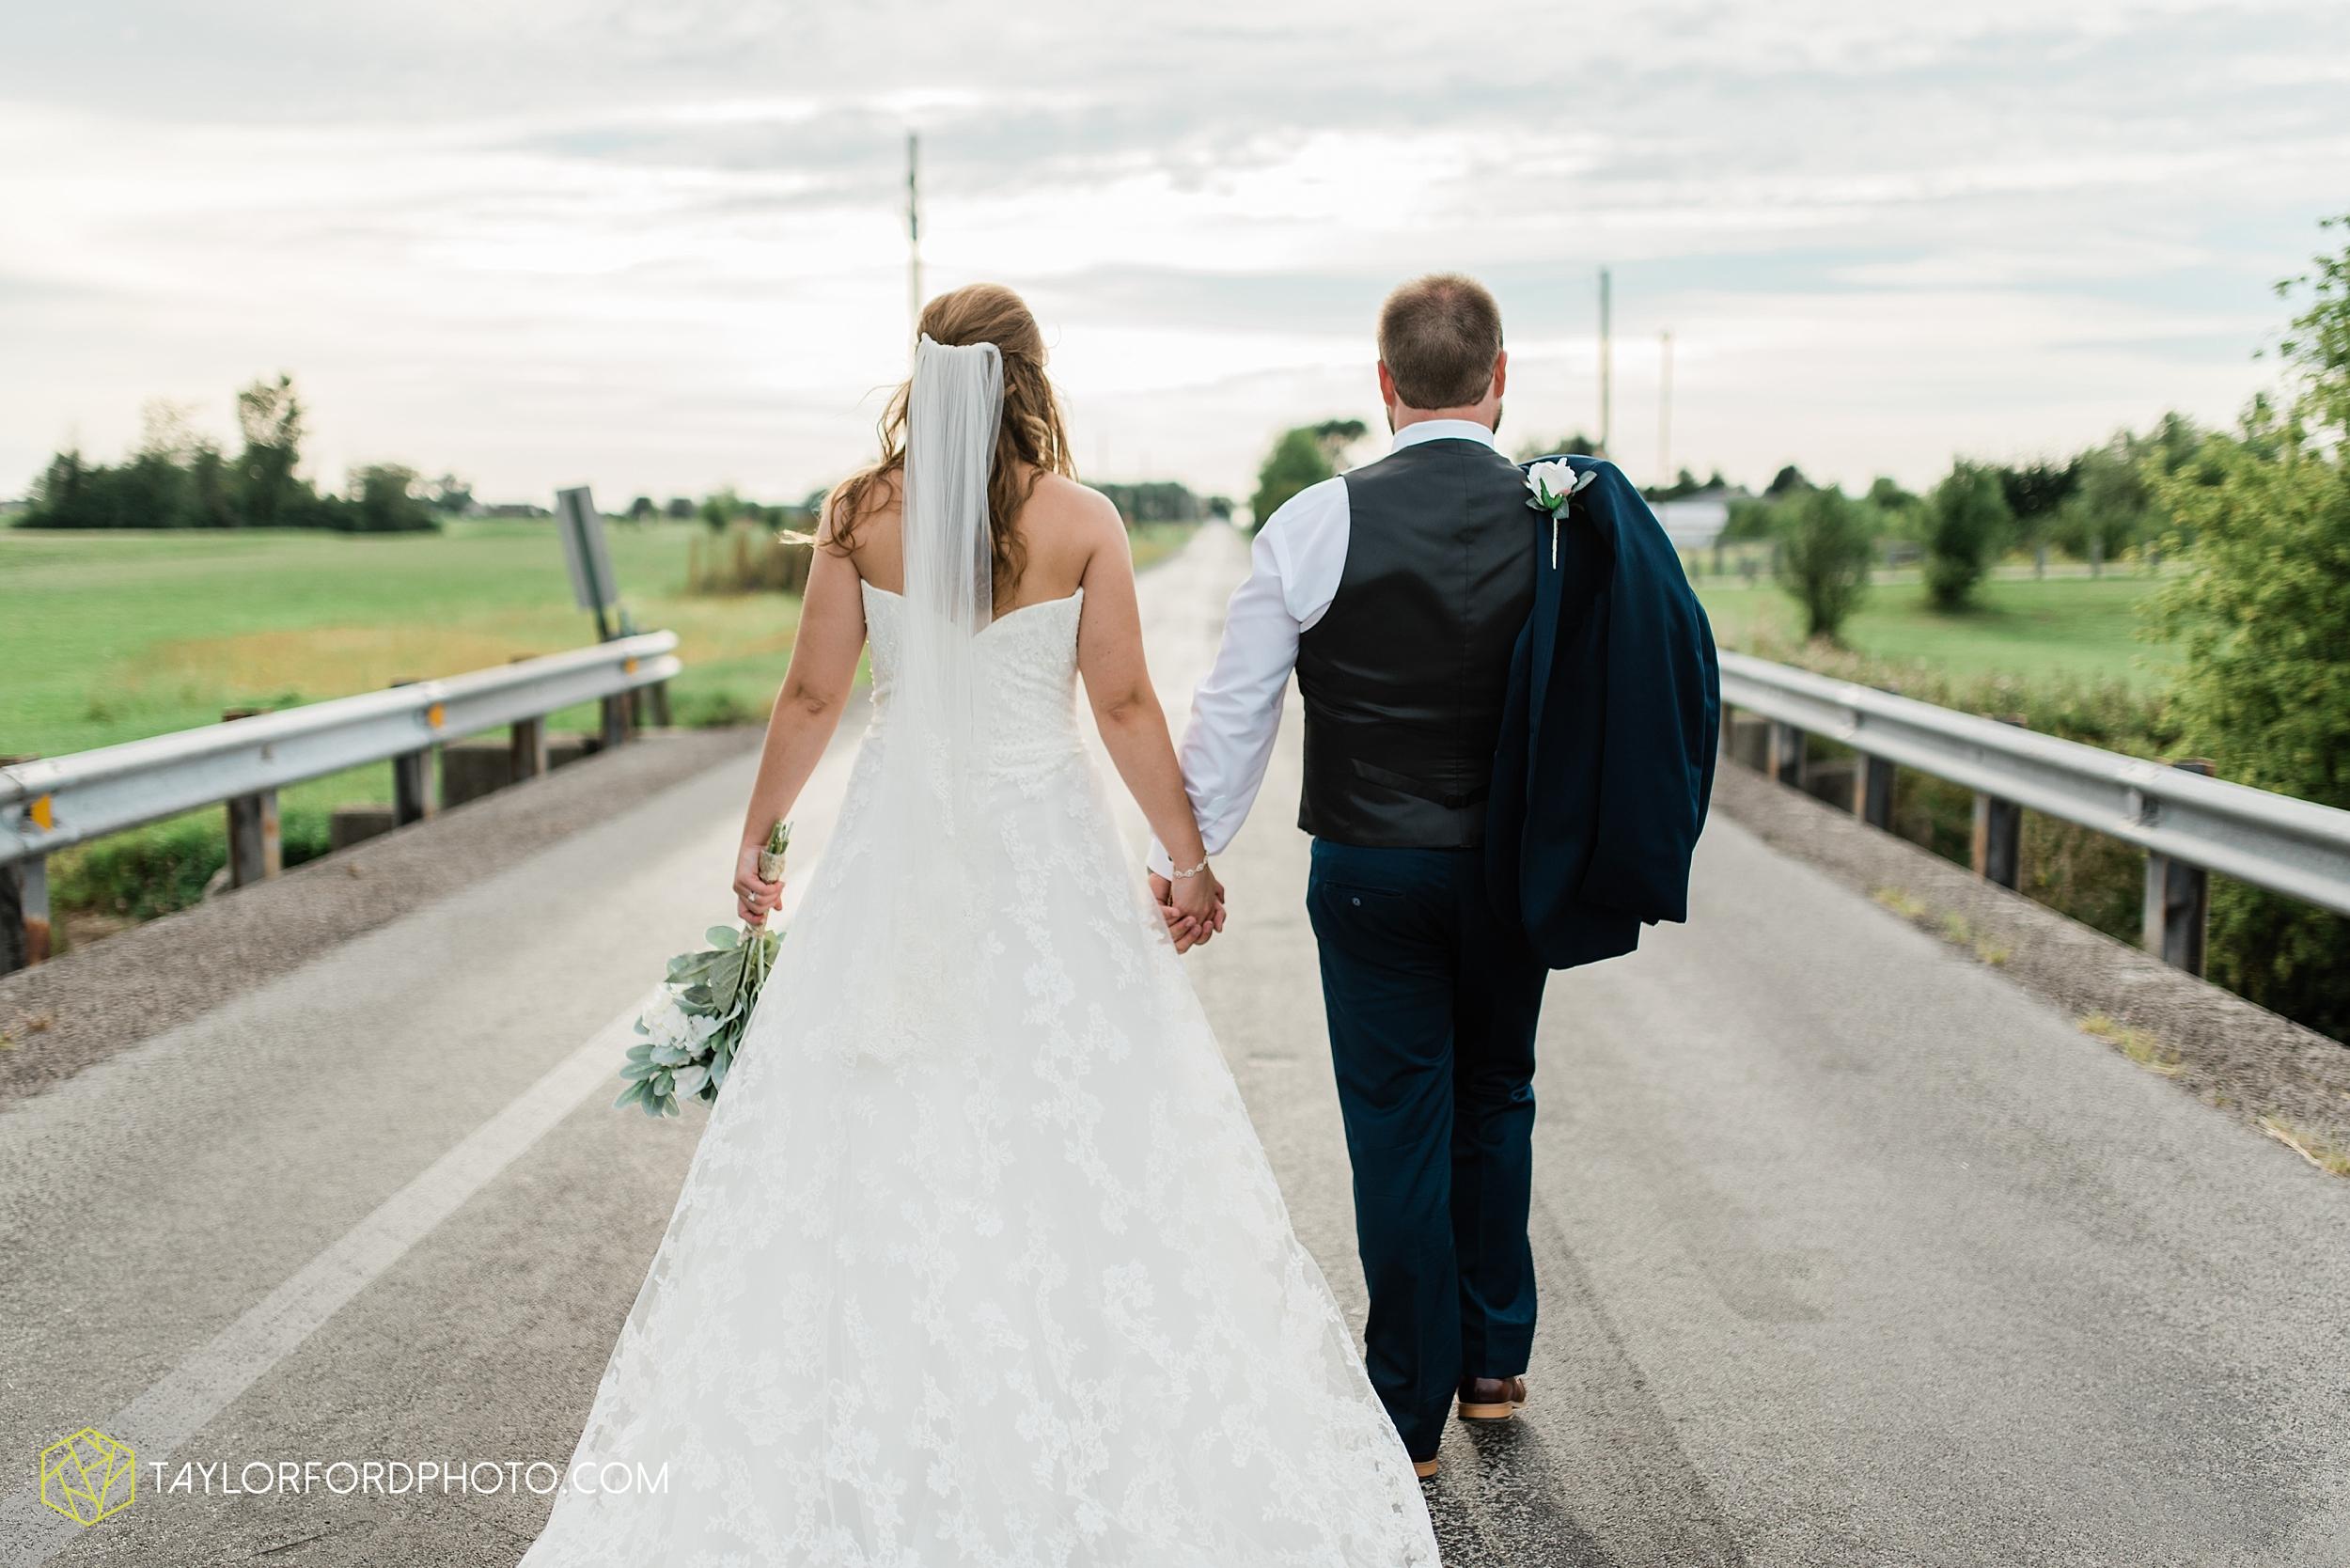 chelsey-zosh-jackson-young-first-united-methodist-church-senior-center-van-wert-ohio-wedding-photographer-taylor-ford-photography_0095.jpg